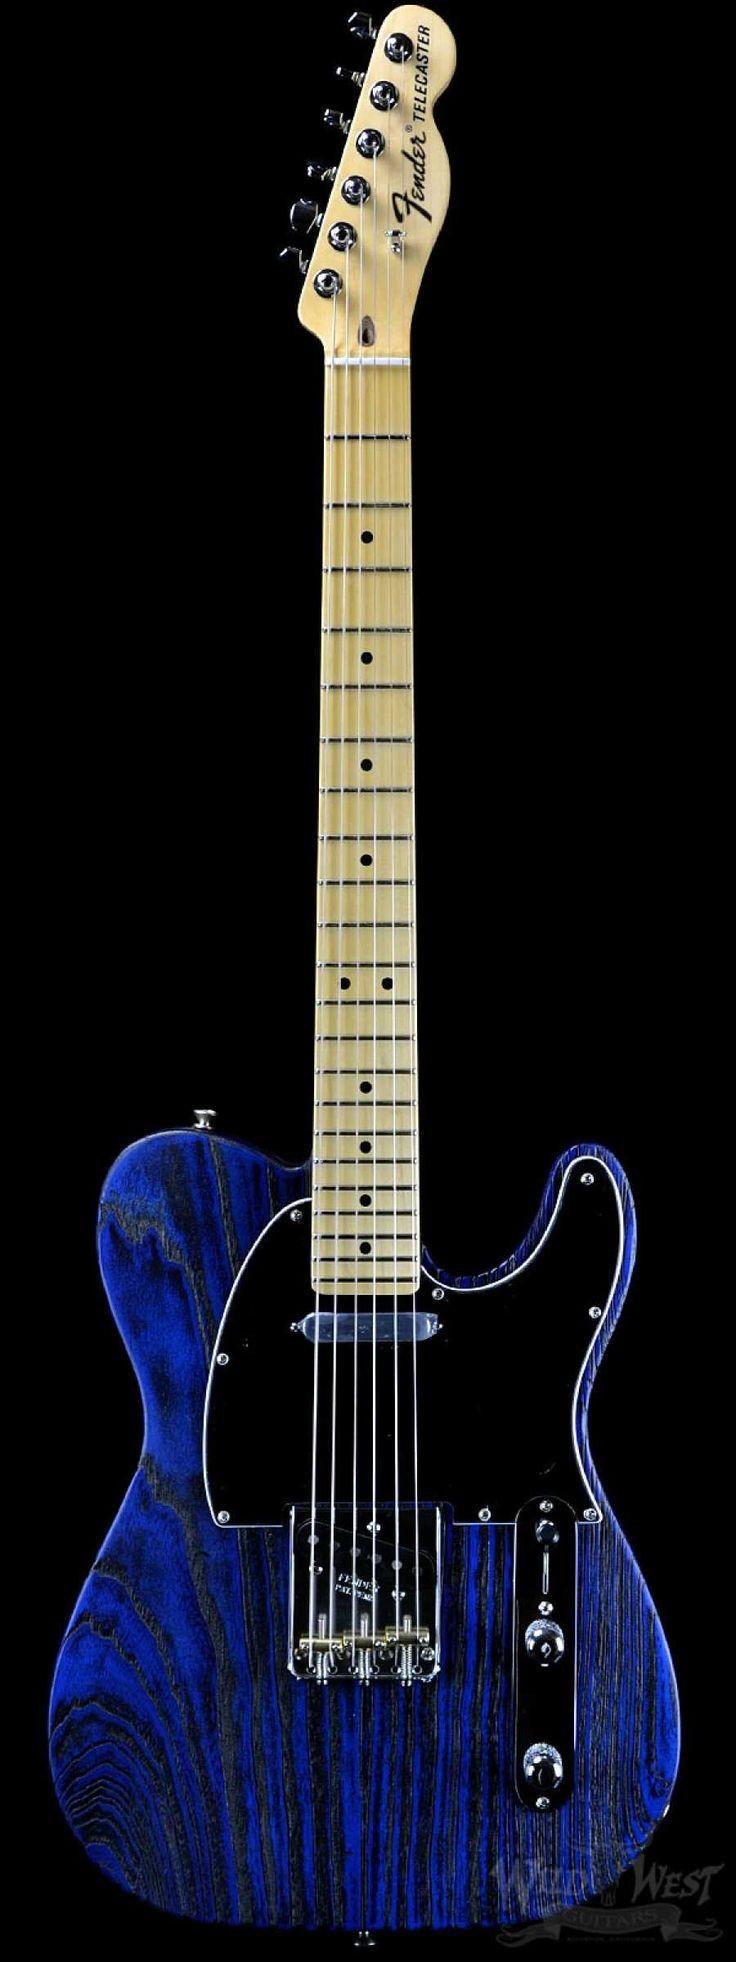 Fender USA Limited Edition Sandblasted Telecaster Sapphire Blue Transparent Wild West Guitars